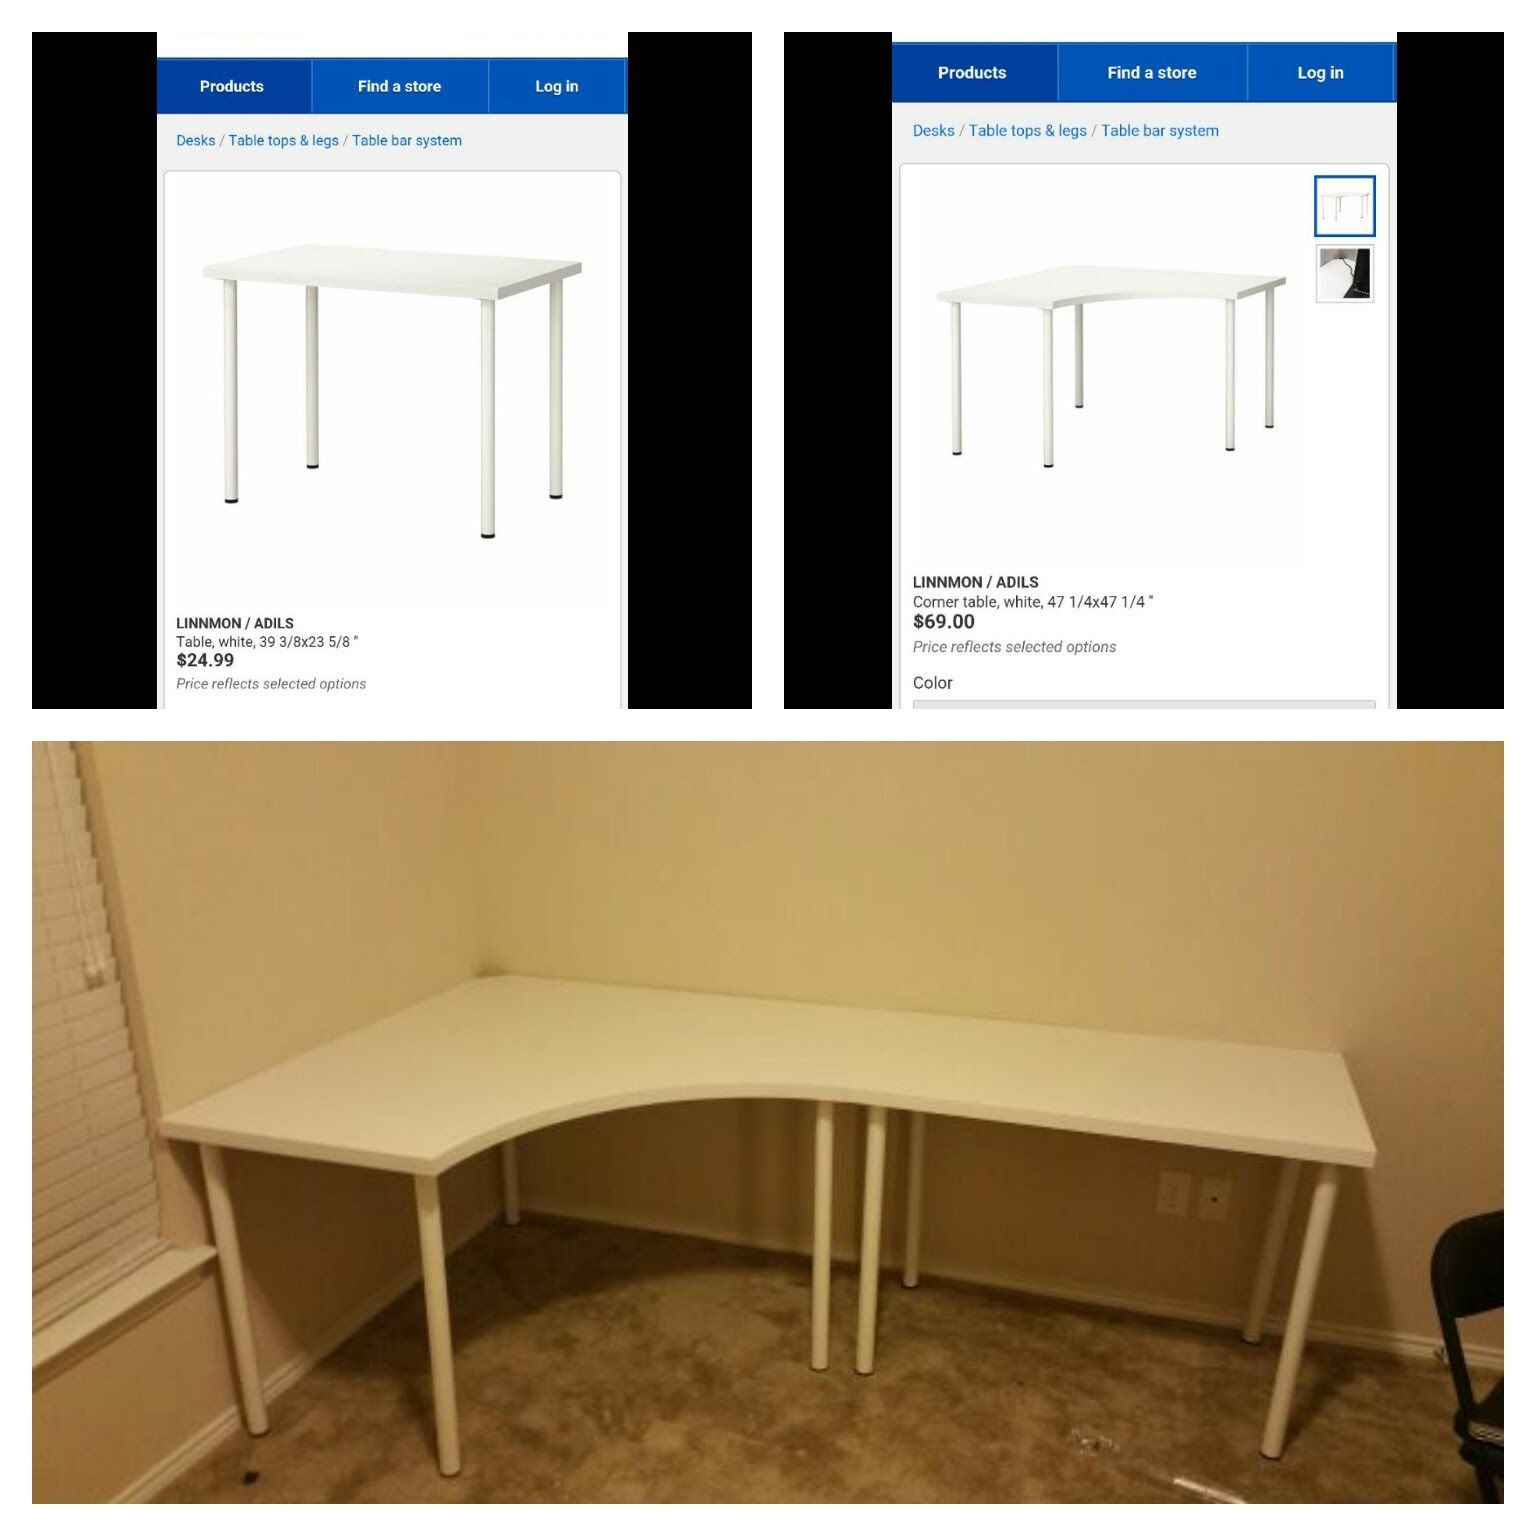 99 Ikea Linnmon Corner Desk Expensive Home Office Furniture